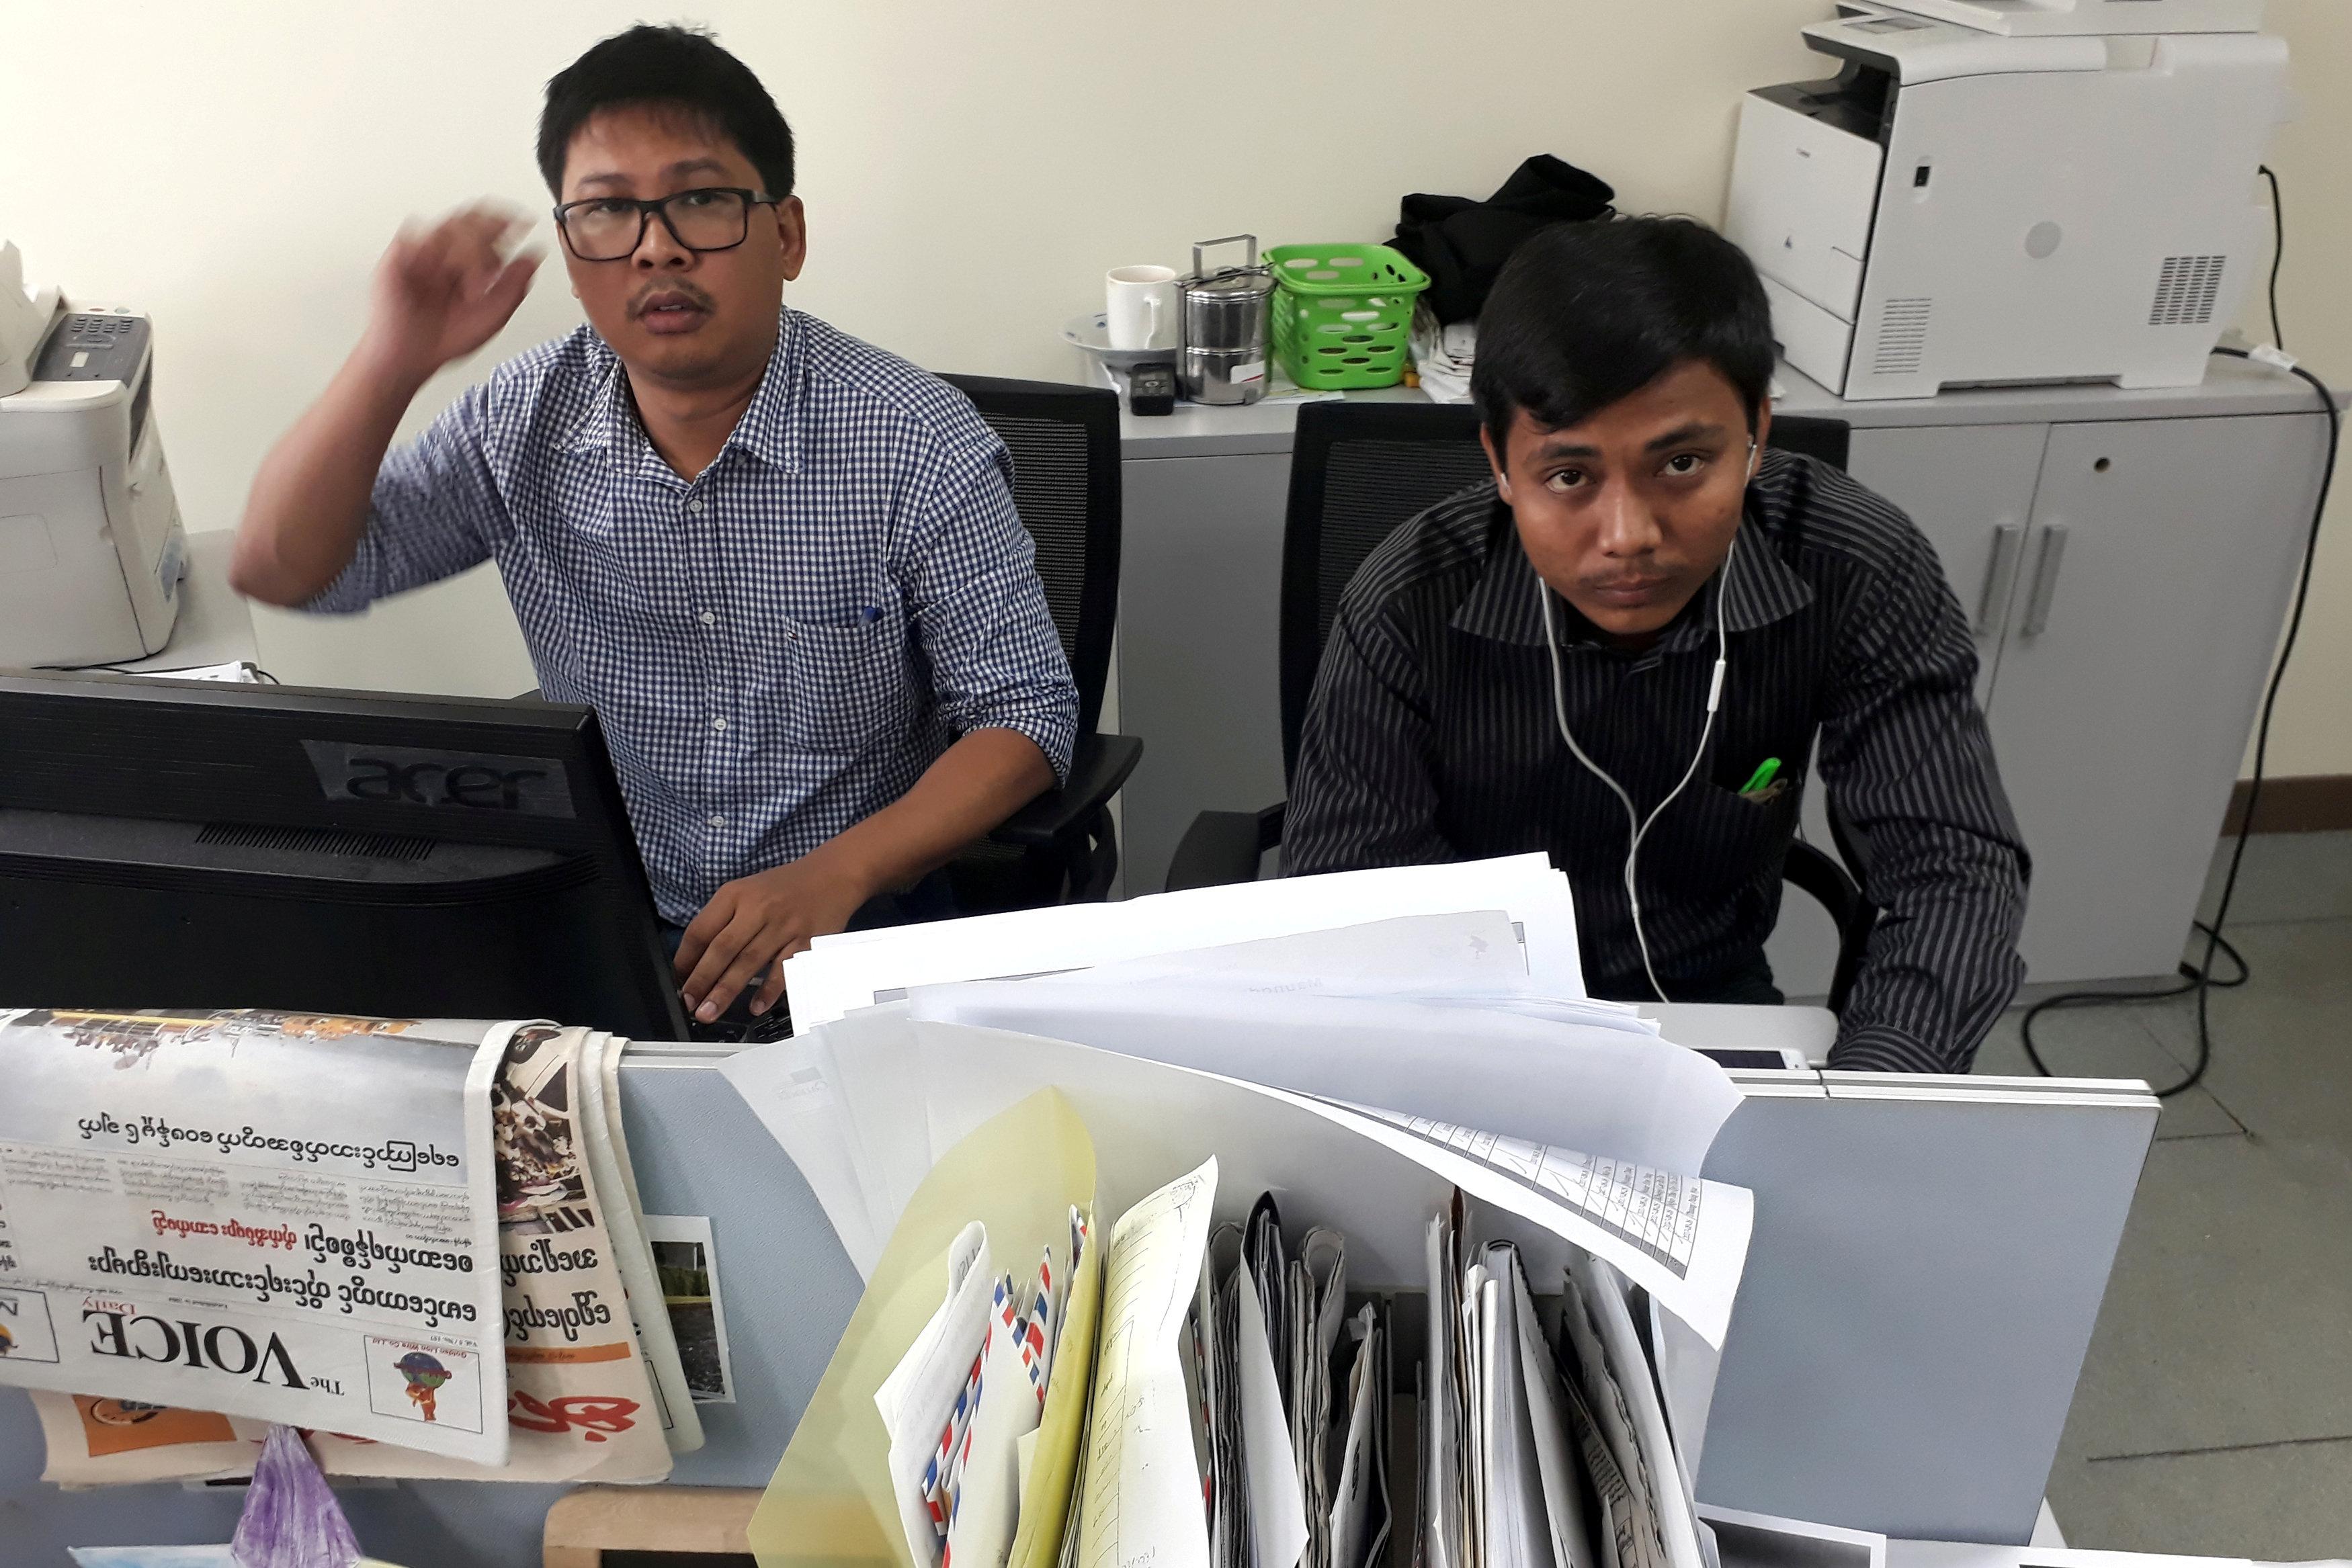 Journalists Wa Lone and Kyaw Soe Oo at the Reuters office in Yangon, Myanmar on Dec. 11, 2017.